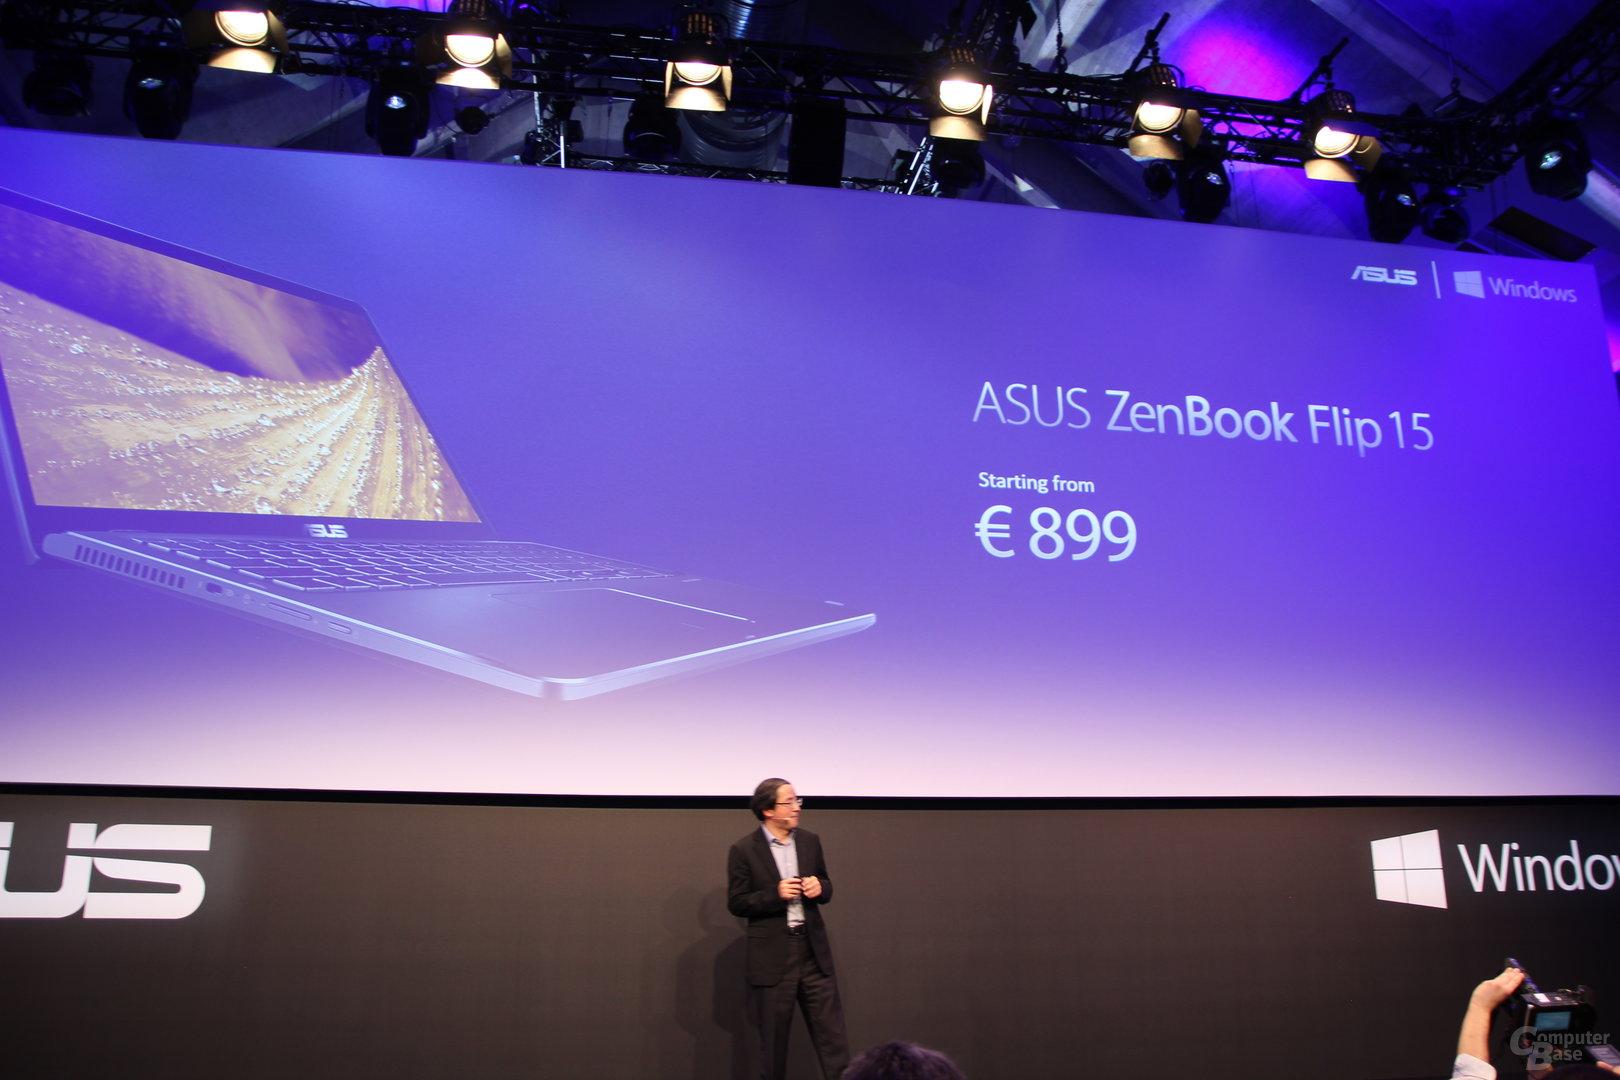 Asus ZenBook Flip 15 ab 899 Euro